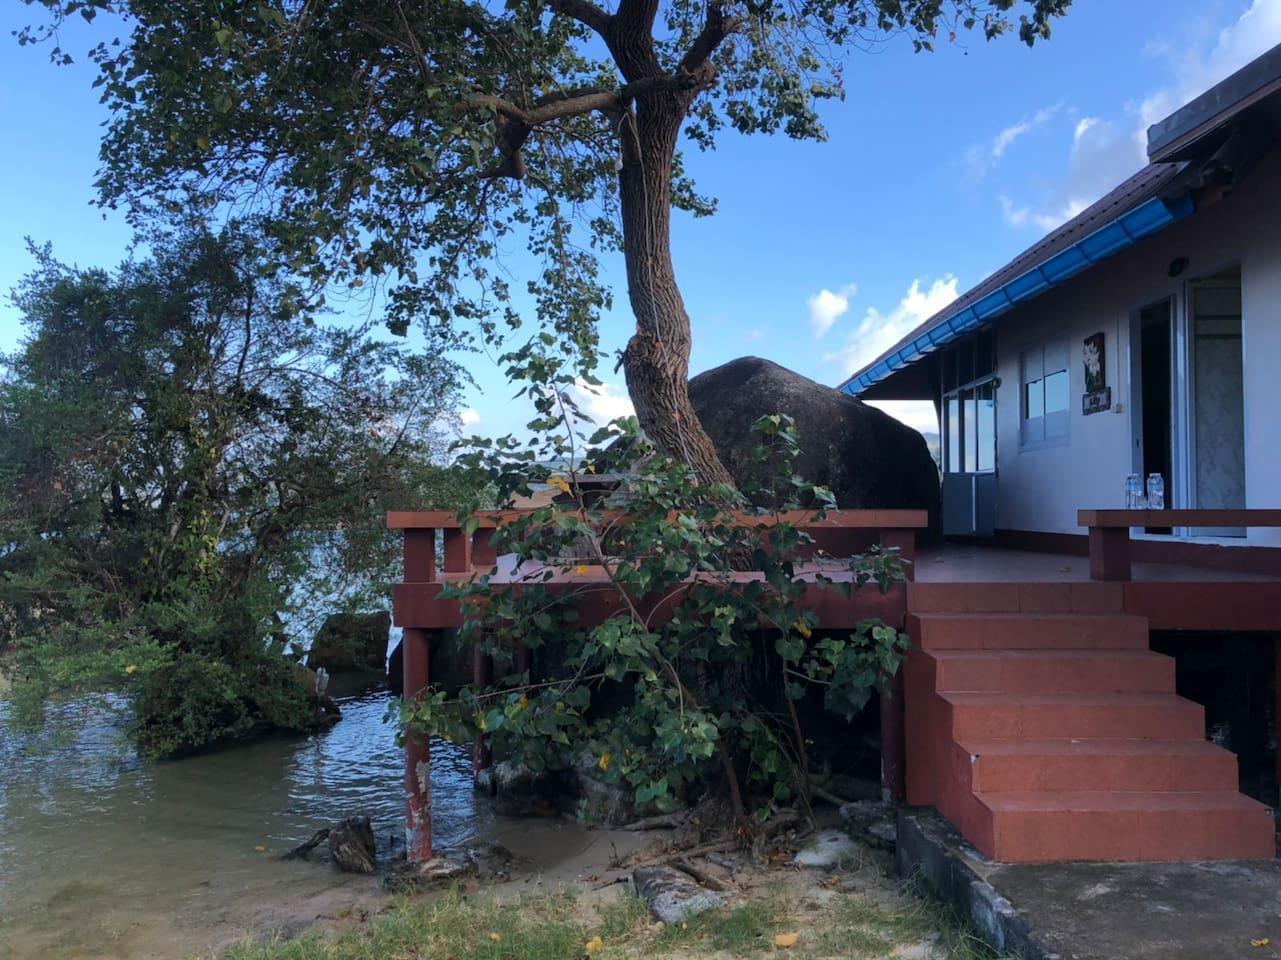 Tharathip Seaview House 2  With Mini Kitchen บ้านเดี่ยว 2 ห้องนอน 2 ห้องน้ำส่วนตัว ขนาด 100 ตร.ม. – วกตุ่ม